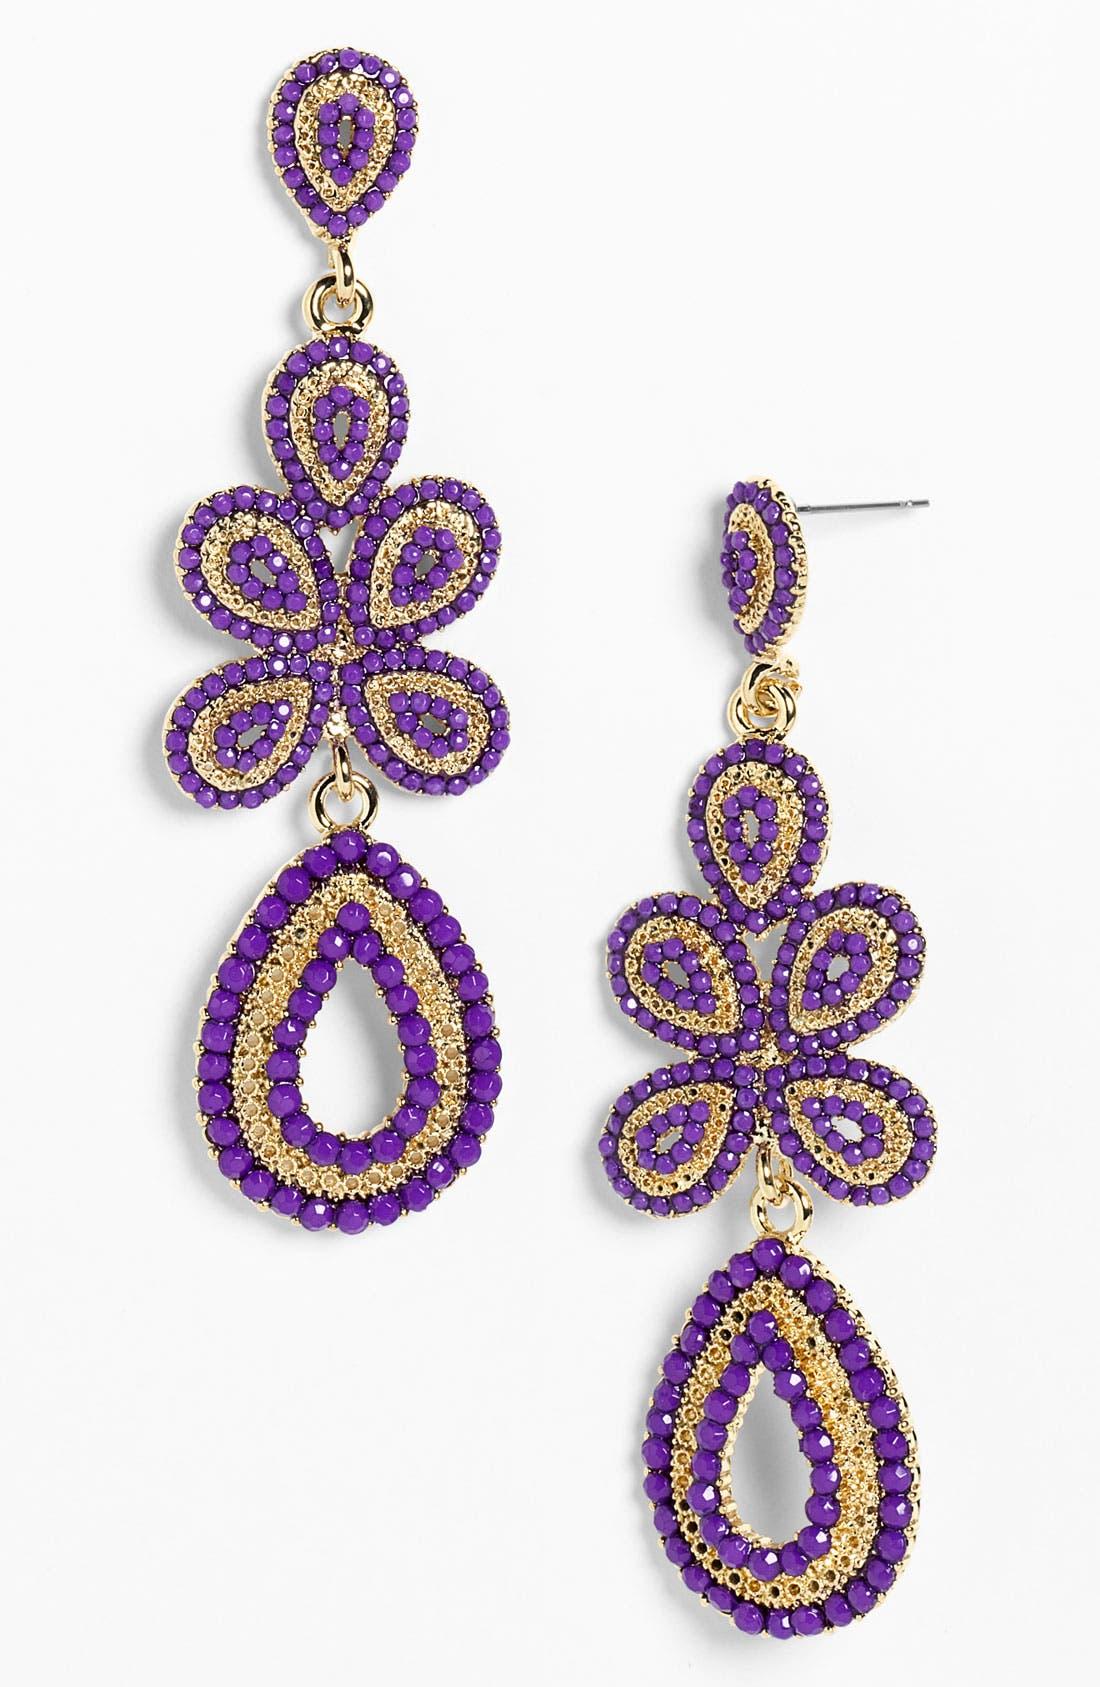 'Ornate' Linear Statement Earrings,                             Main thumbnail 11, color,